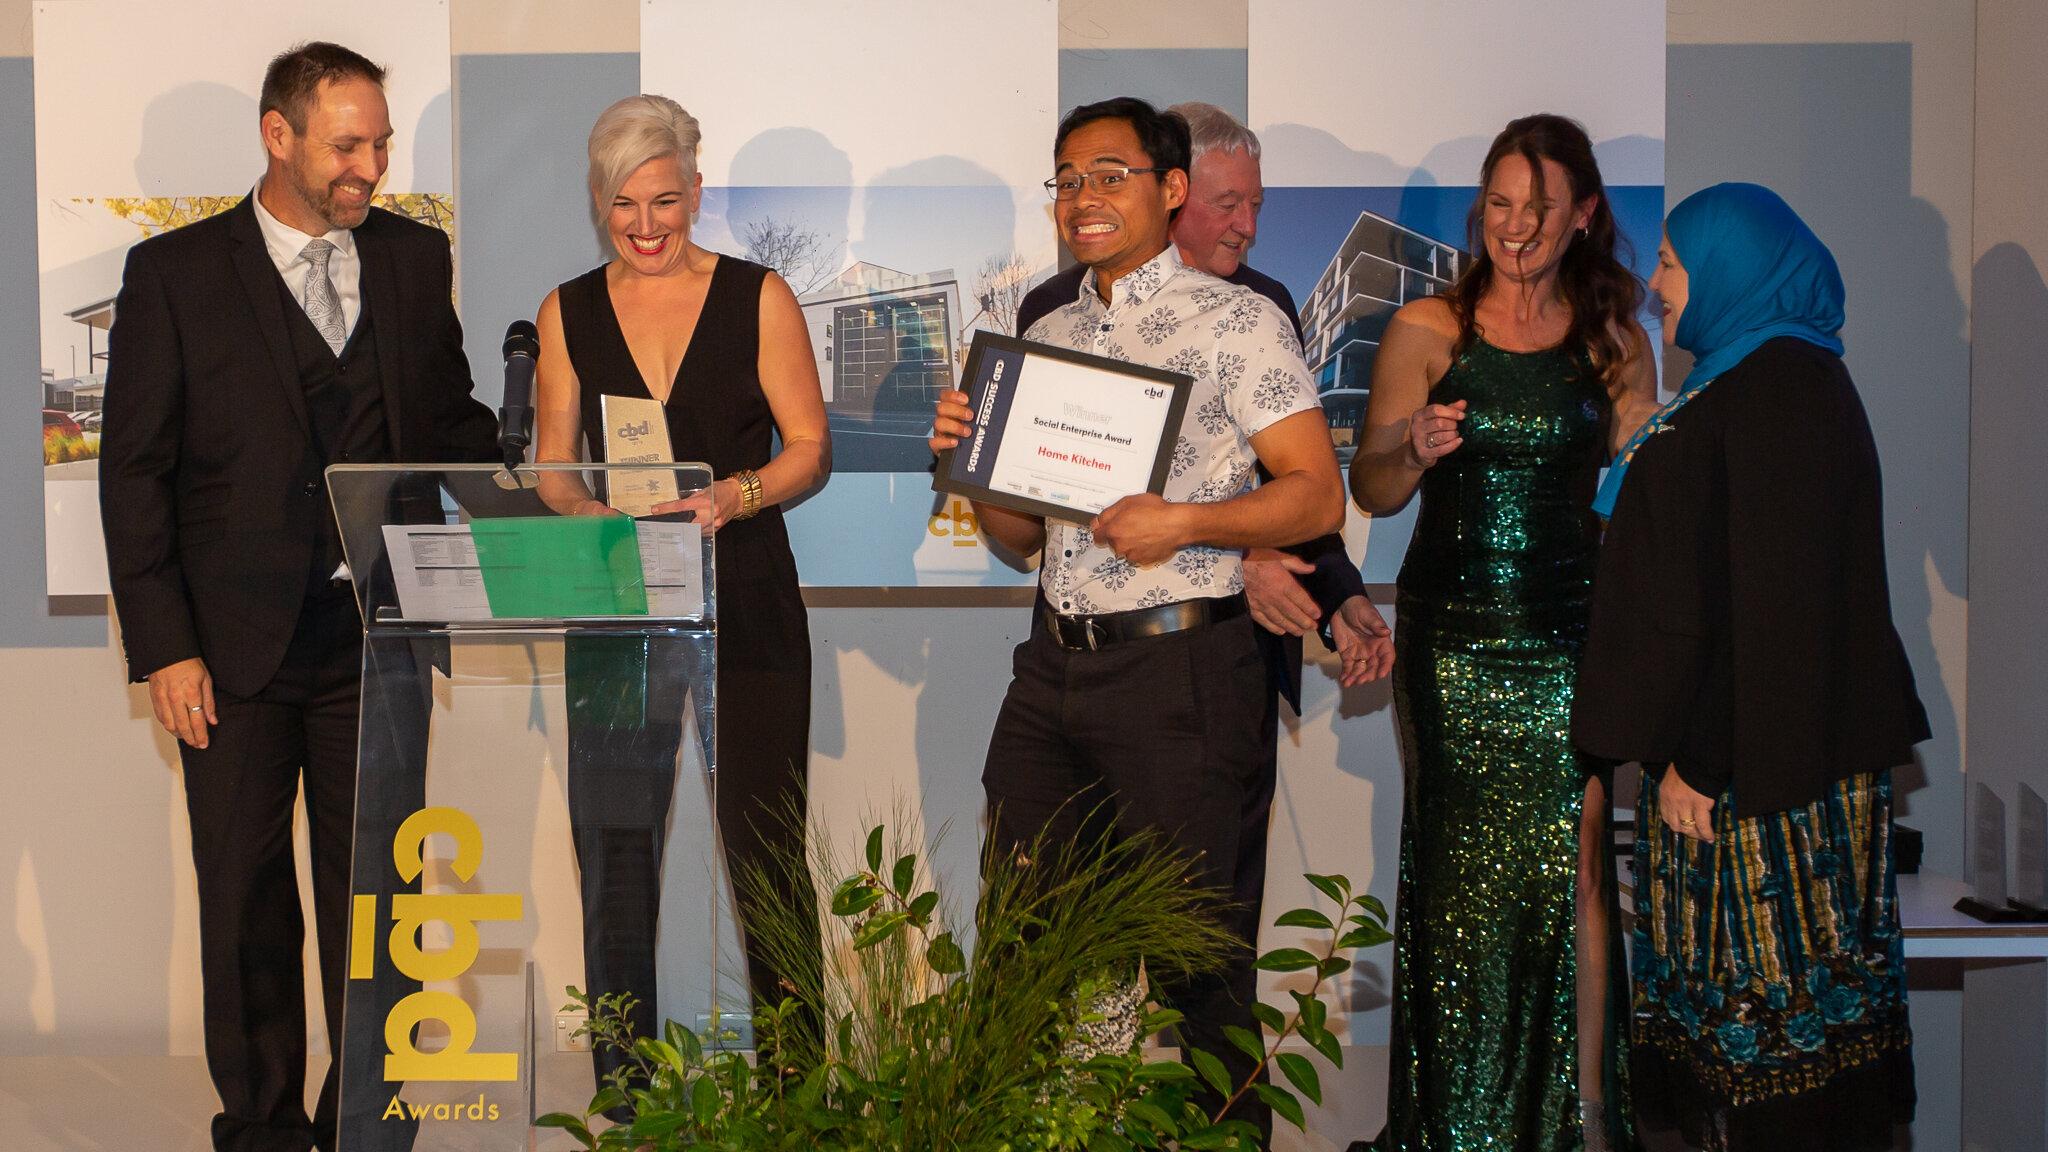 Social Enterprise Award! - Congratulations to the Home Kitchen team for taking out the Social Enterprise Award last night at the #hamiltoncbdawards. Delighted for our wonderful chefs, front of house team, volunteers and trustees who bring the magic to all that is Home Kitchen! Pictured, Tania Jones (Founder), Samir Harith (Trustee), Maysa Sheik Al Ard (Operations Manager)Home Kitchen Team (Not Pictured): Nikbakht Danish, Taj Begum, Abu bkr Alzraiqi, Ali Alzvaiqi, Diaa Alzreikat, Frozan Aziz, Masooma Aziz, Nawahel Alzinati, Sofaida Bin Ilyas, Saboor Abdul, Umar Abdul